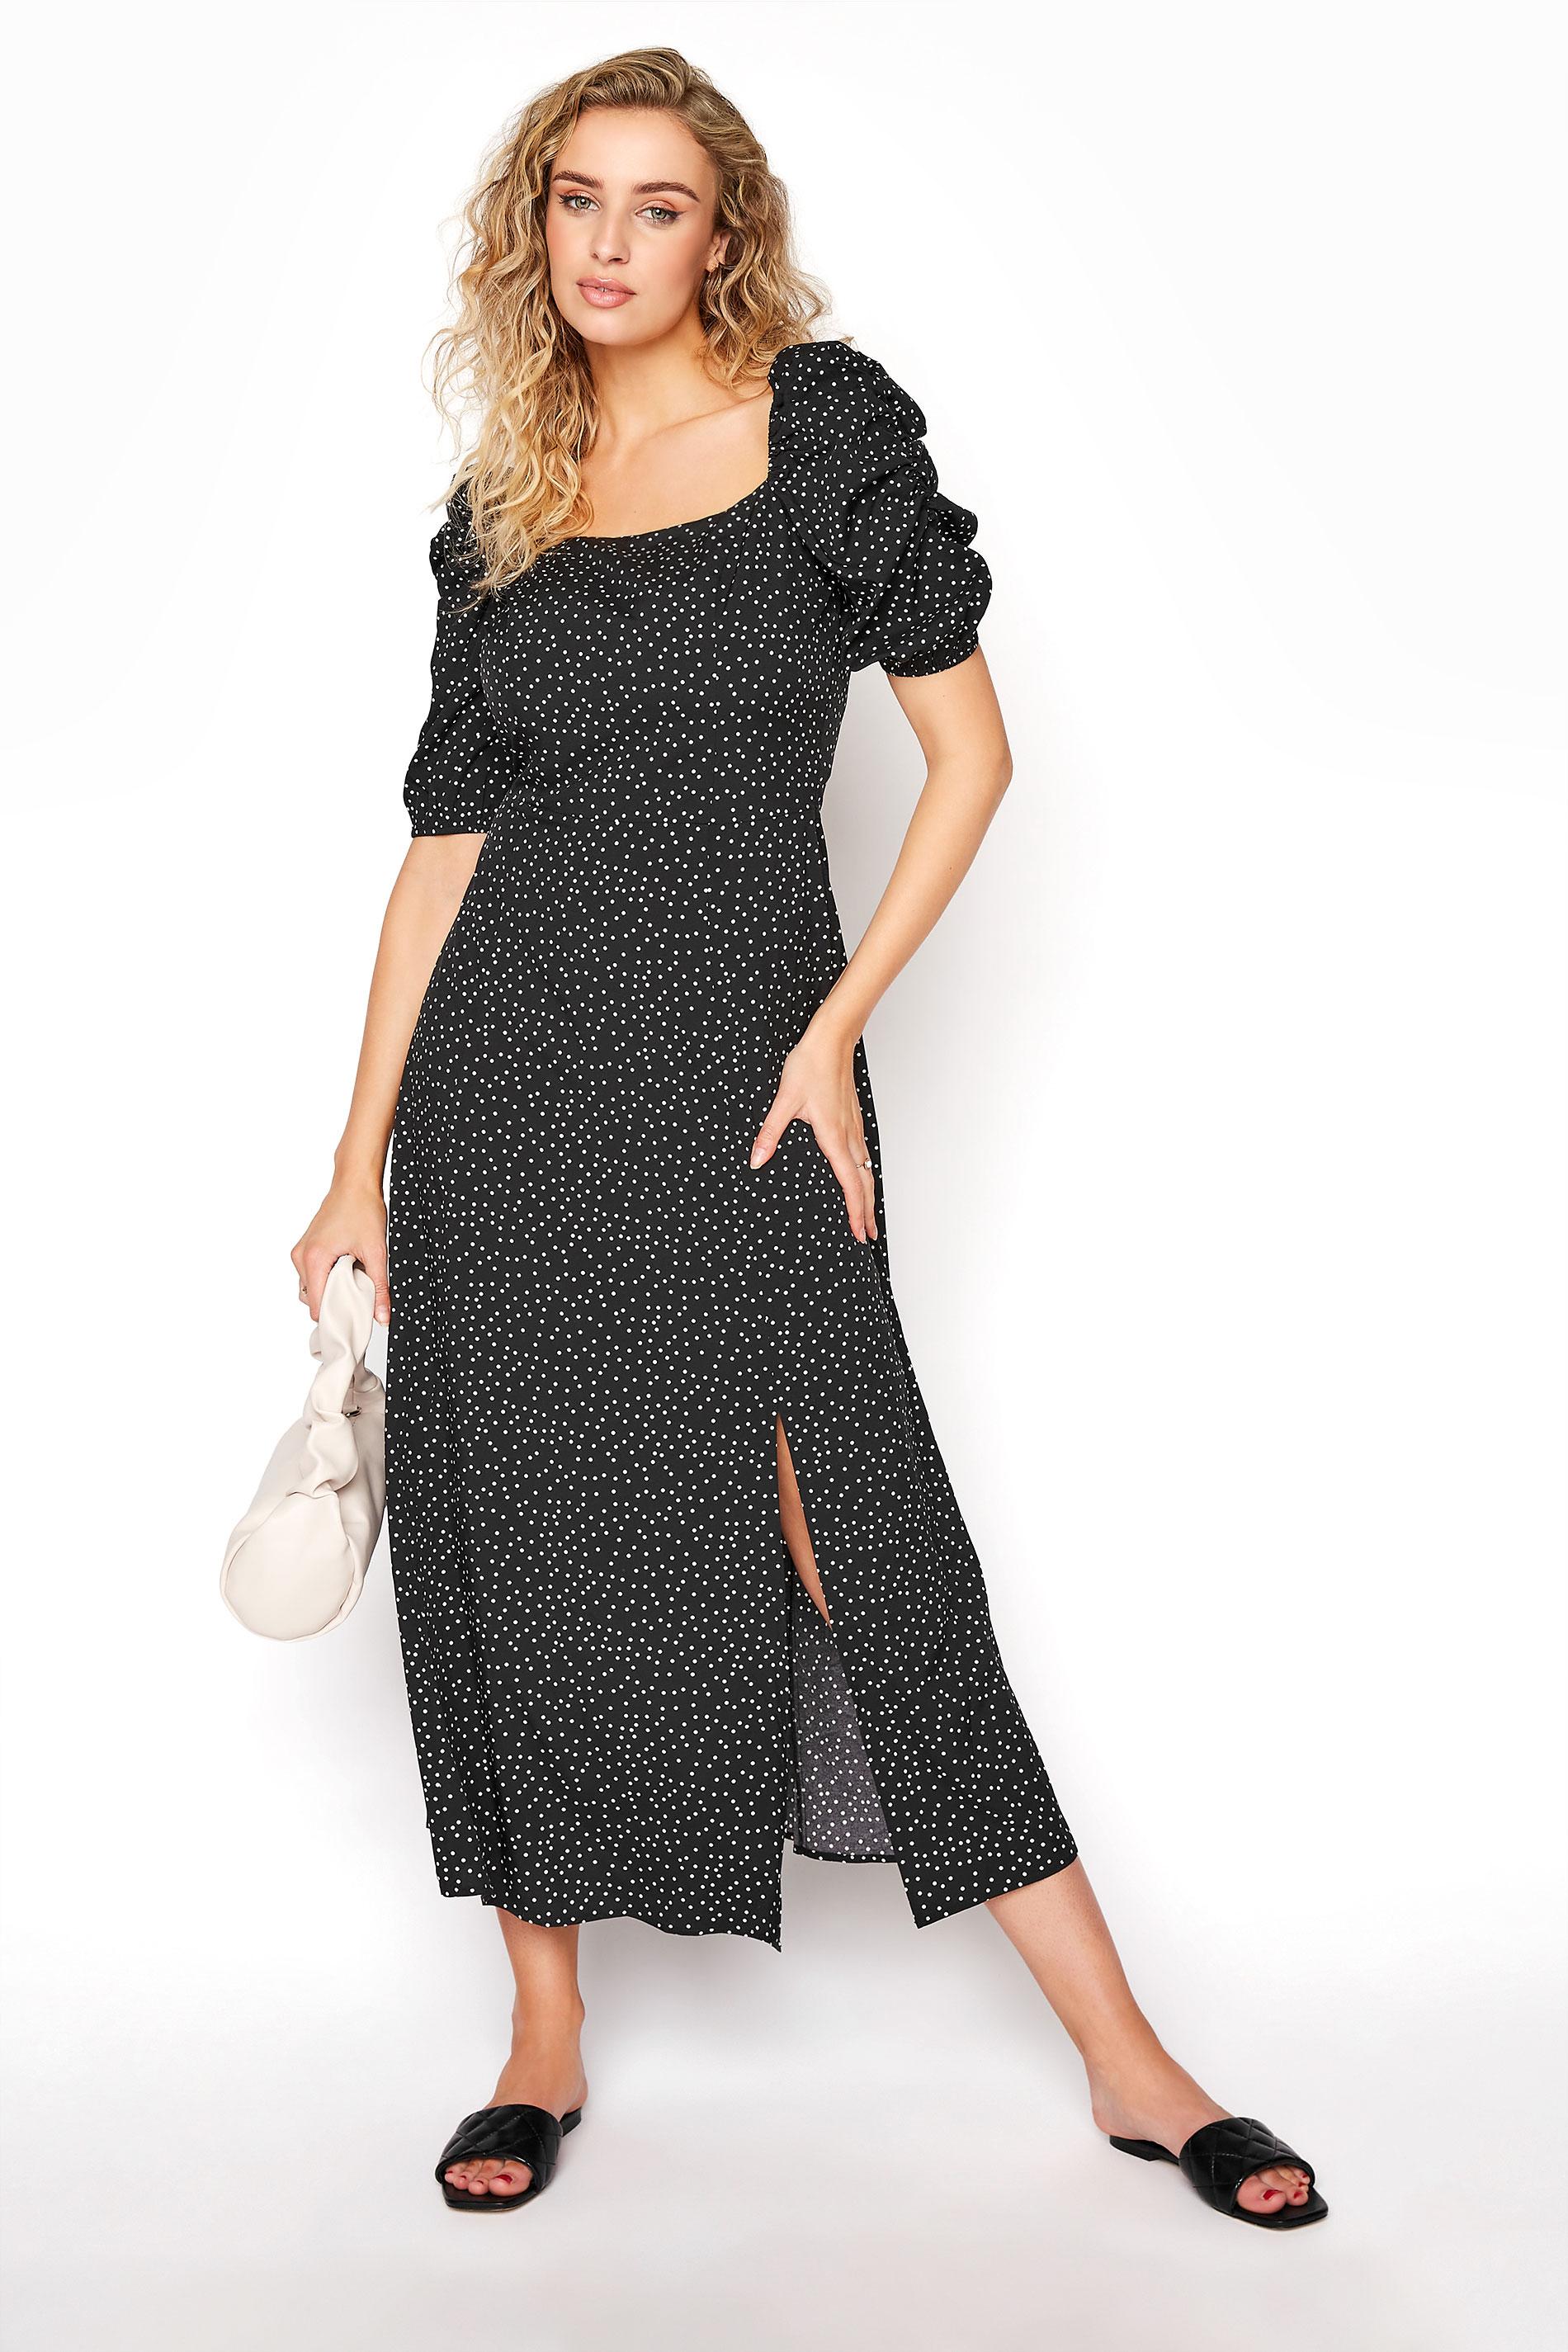 LTS Black Polka Dot Puff Sleeve Midaxi Dress